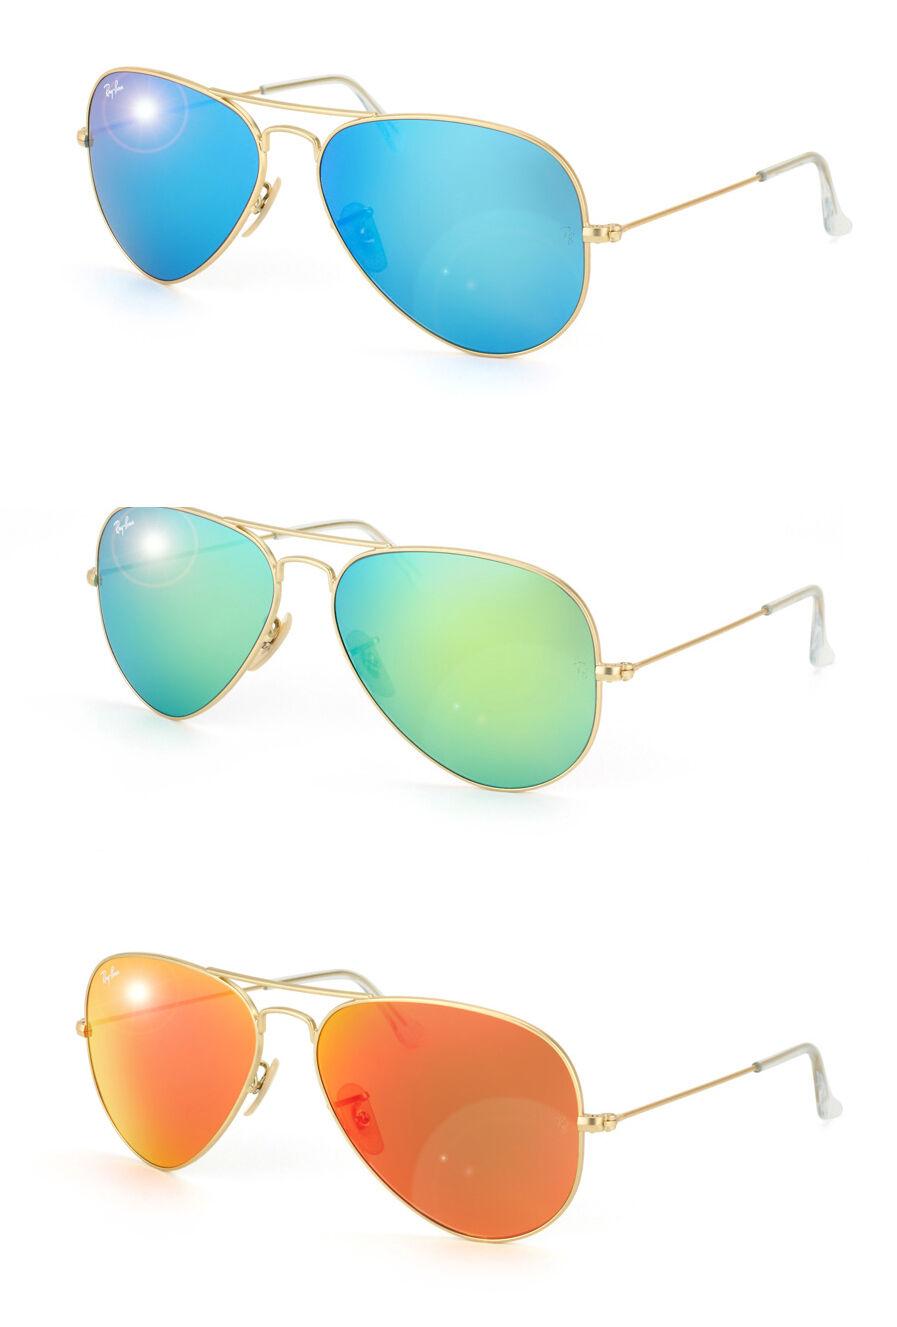 3690953b62 Brand New!! Ray-Ban Aviator Large Metal Sunglasses.. in Pakaian ...